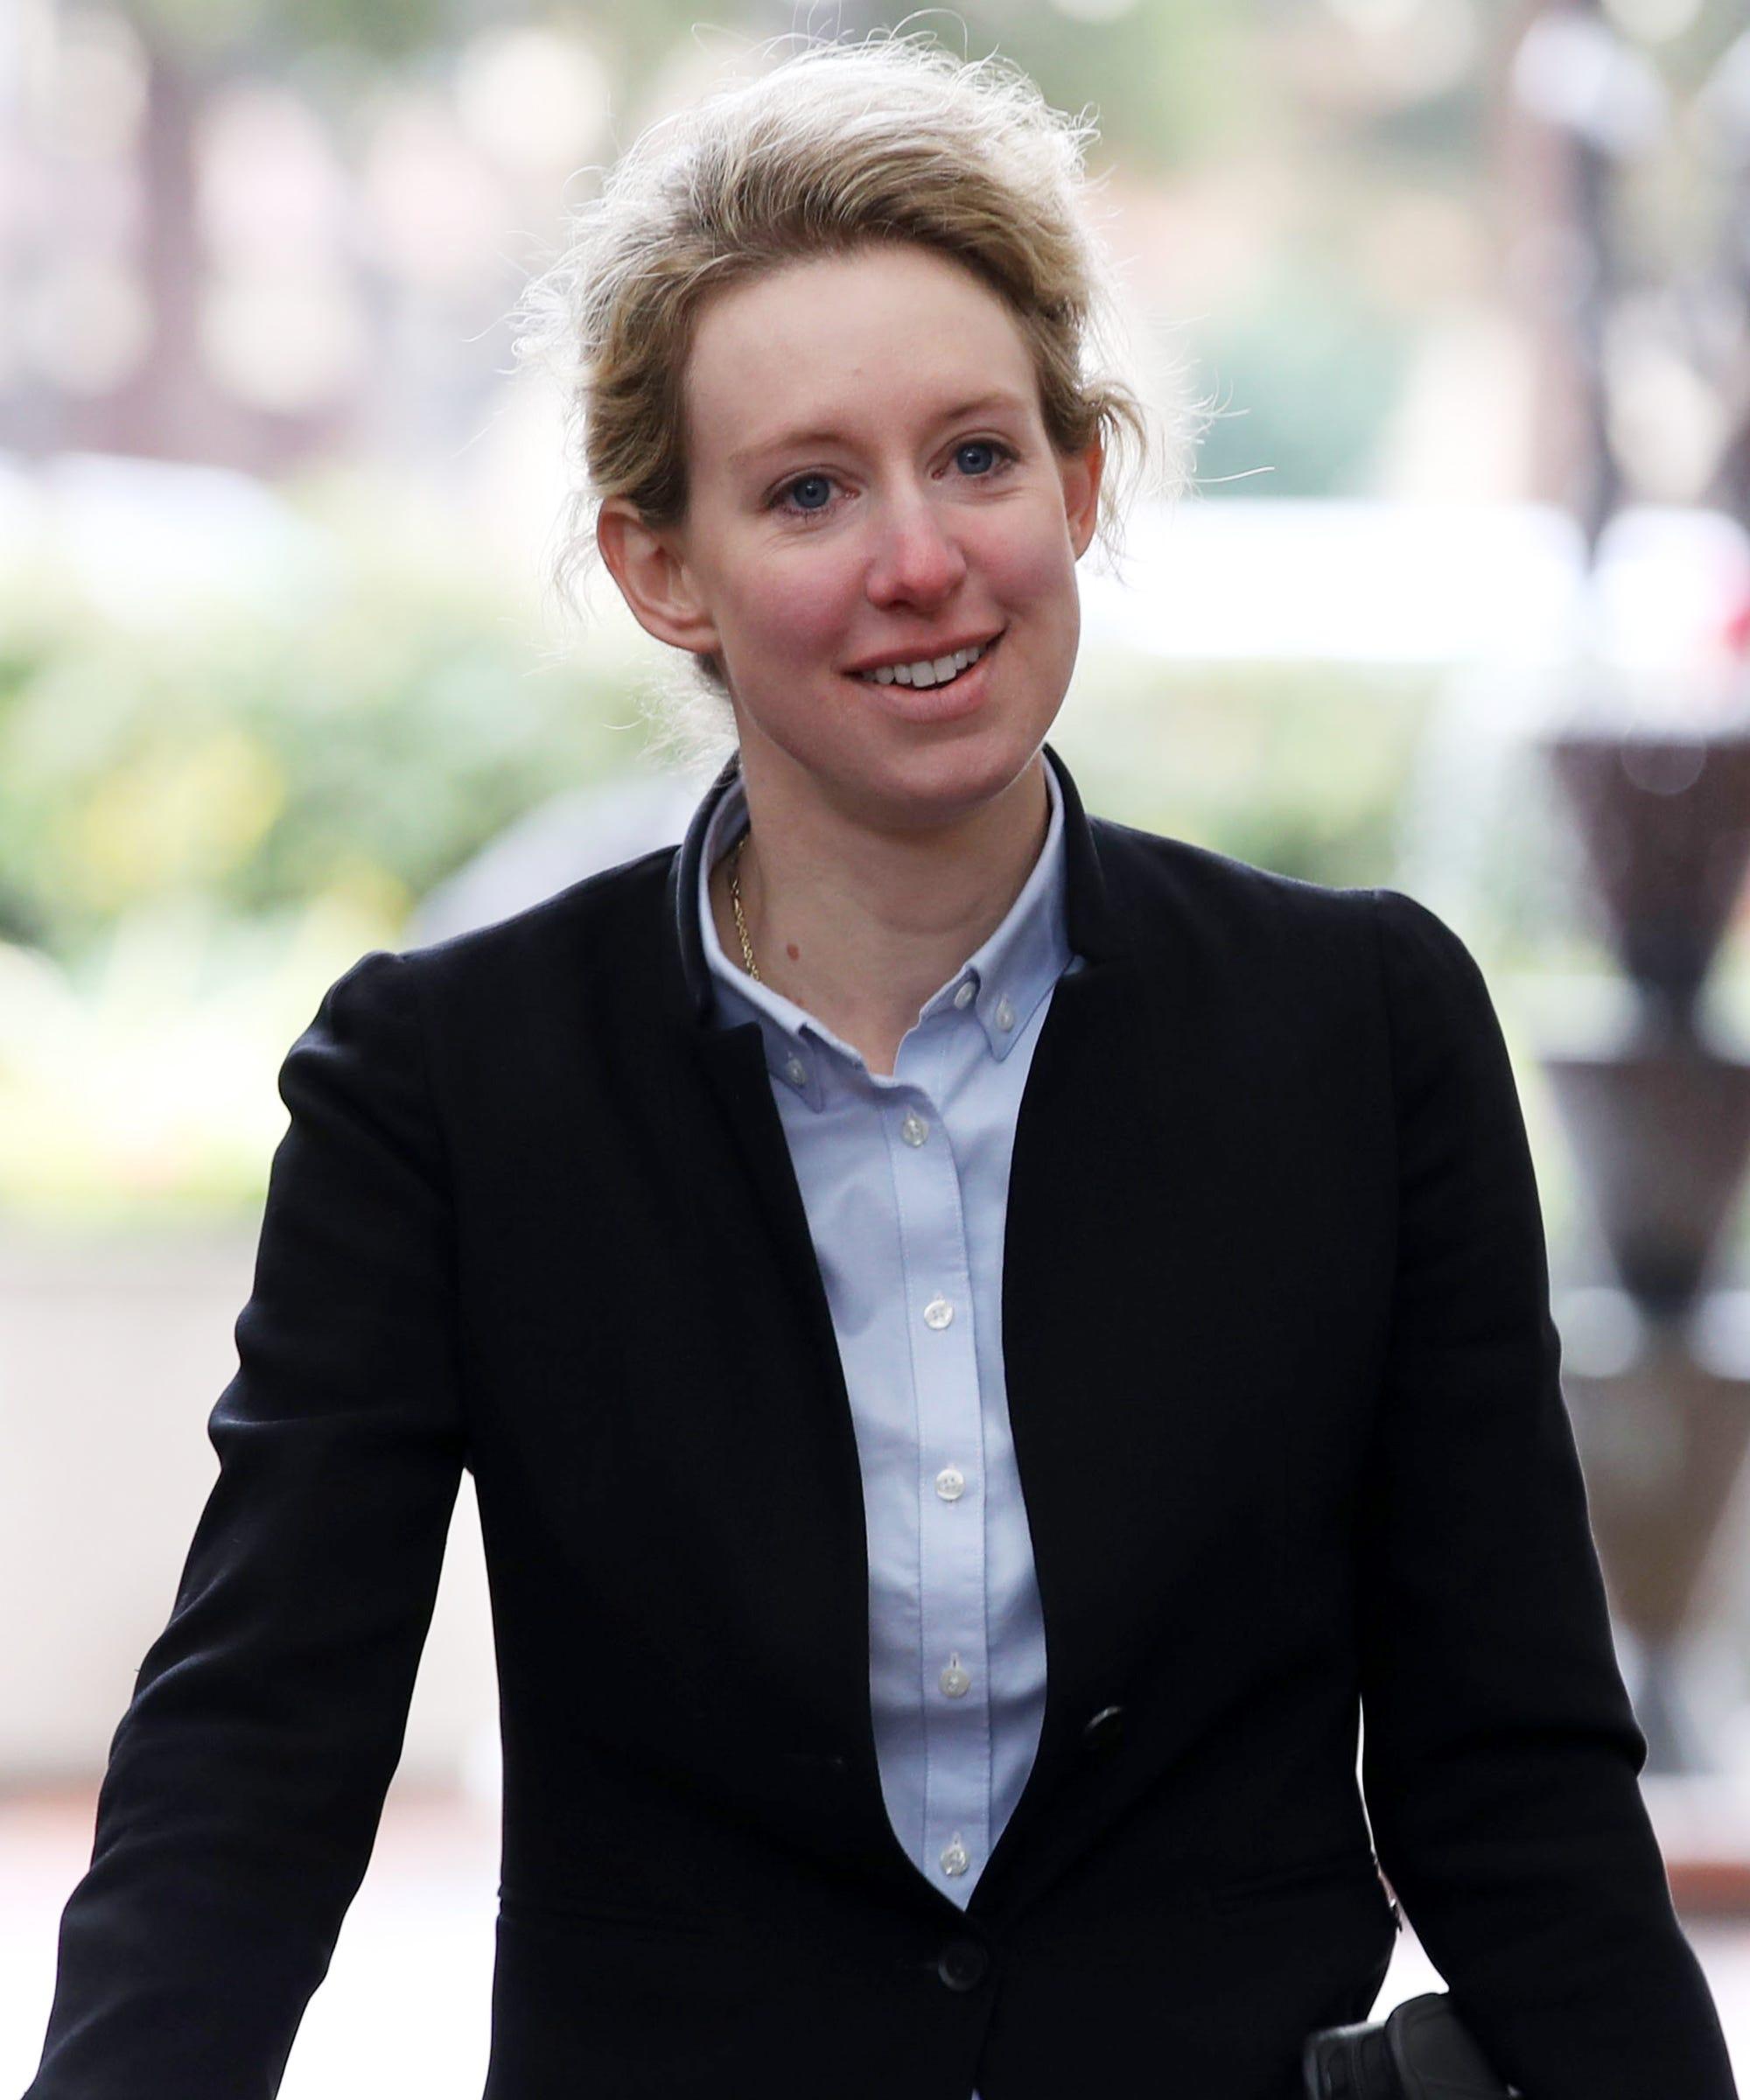 Spotted: Elizabeth Holmes Didn't Wear A Black Turtleneck In Court